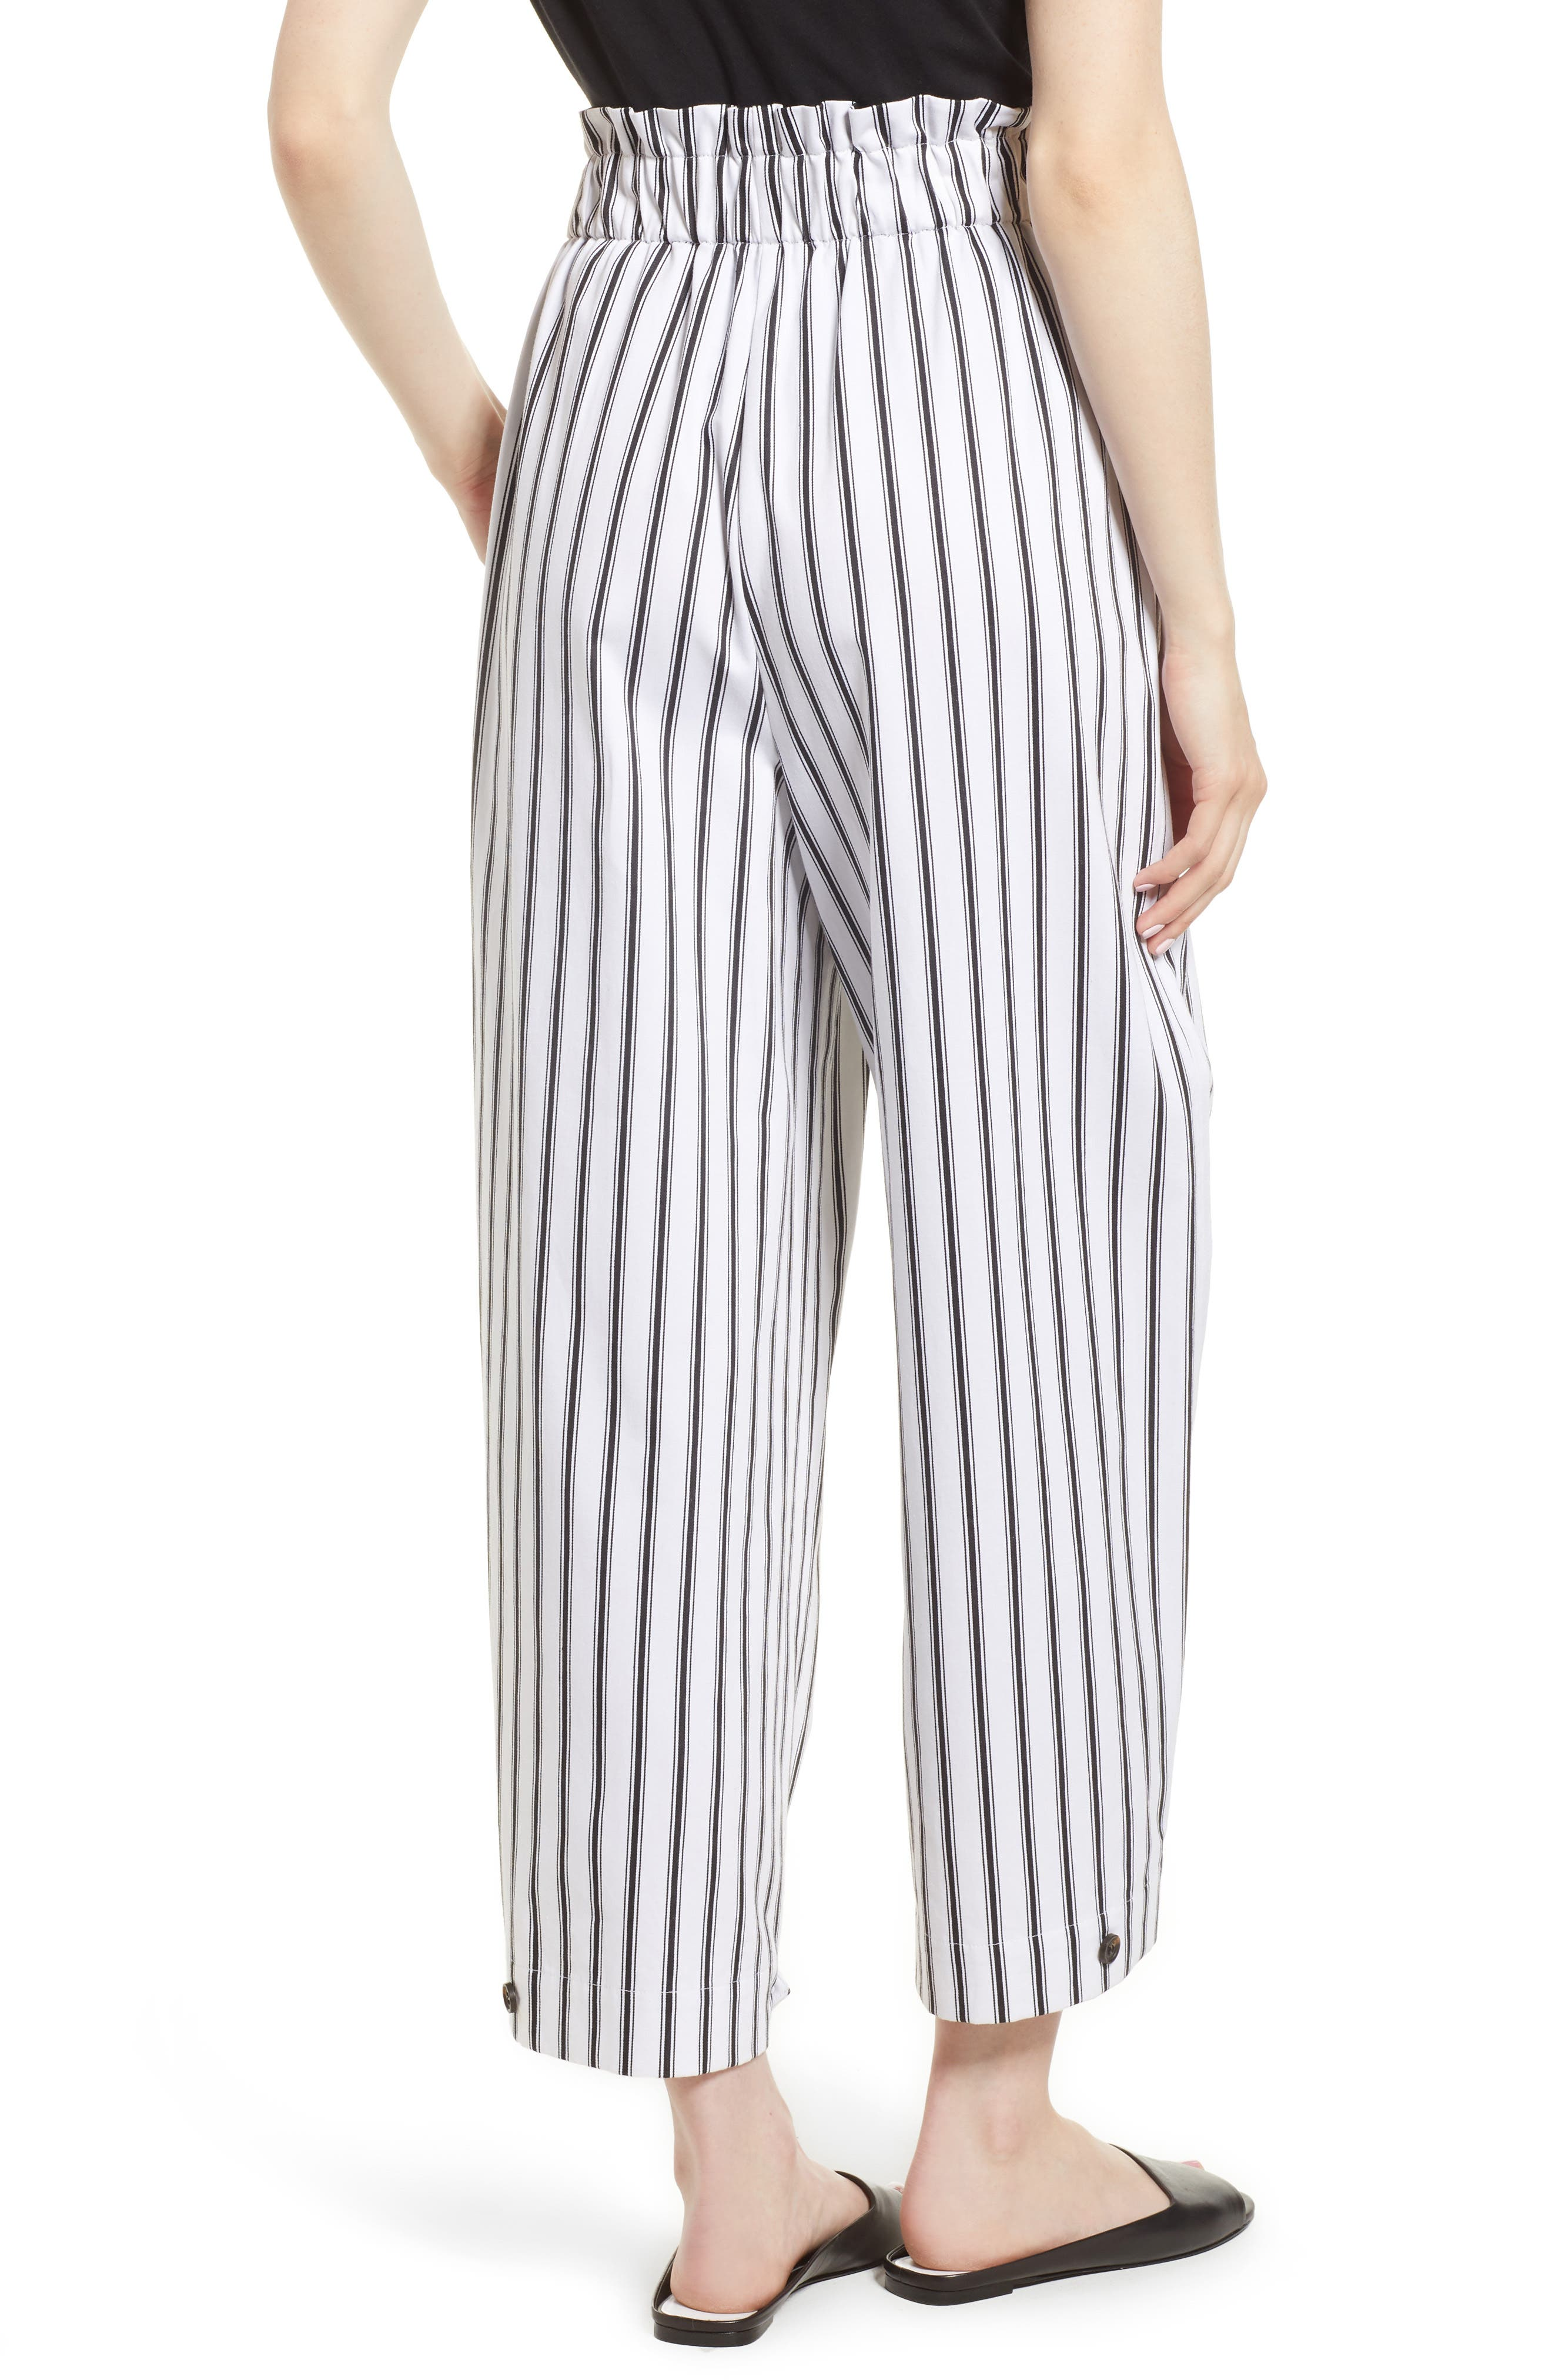 High Waist Convertible Wide Leg Pants,                             Alternate thumbnail 2, color,                             Black/ White Striped